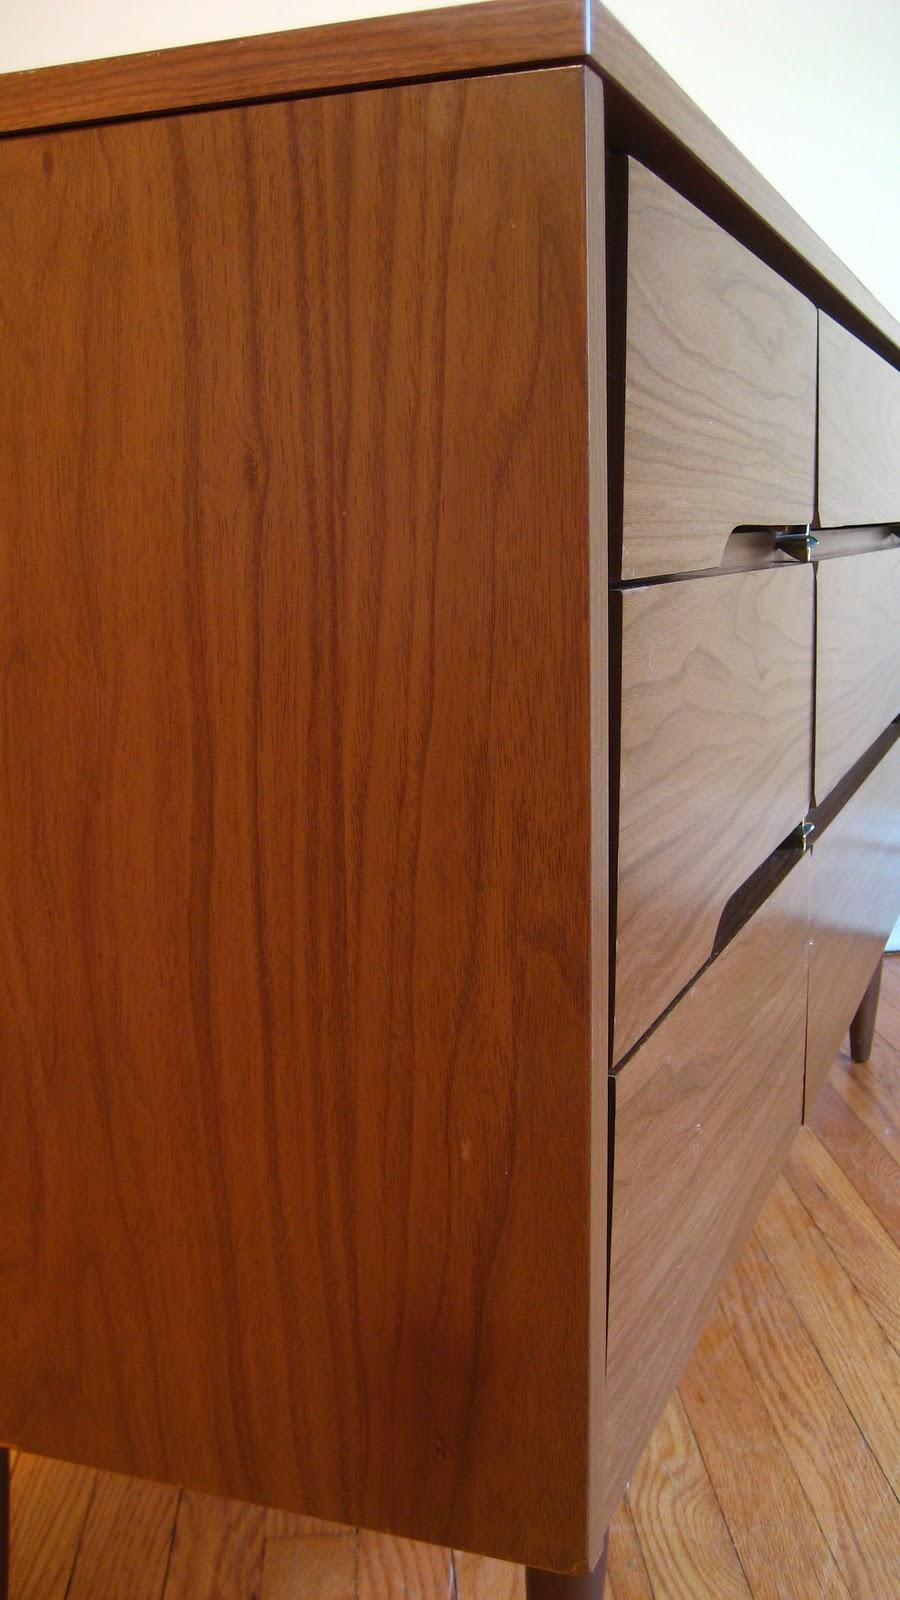 Flatout Design Kroehler Dresser Credenza